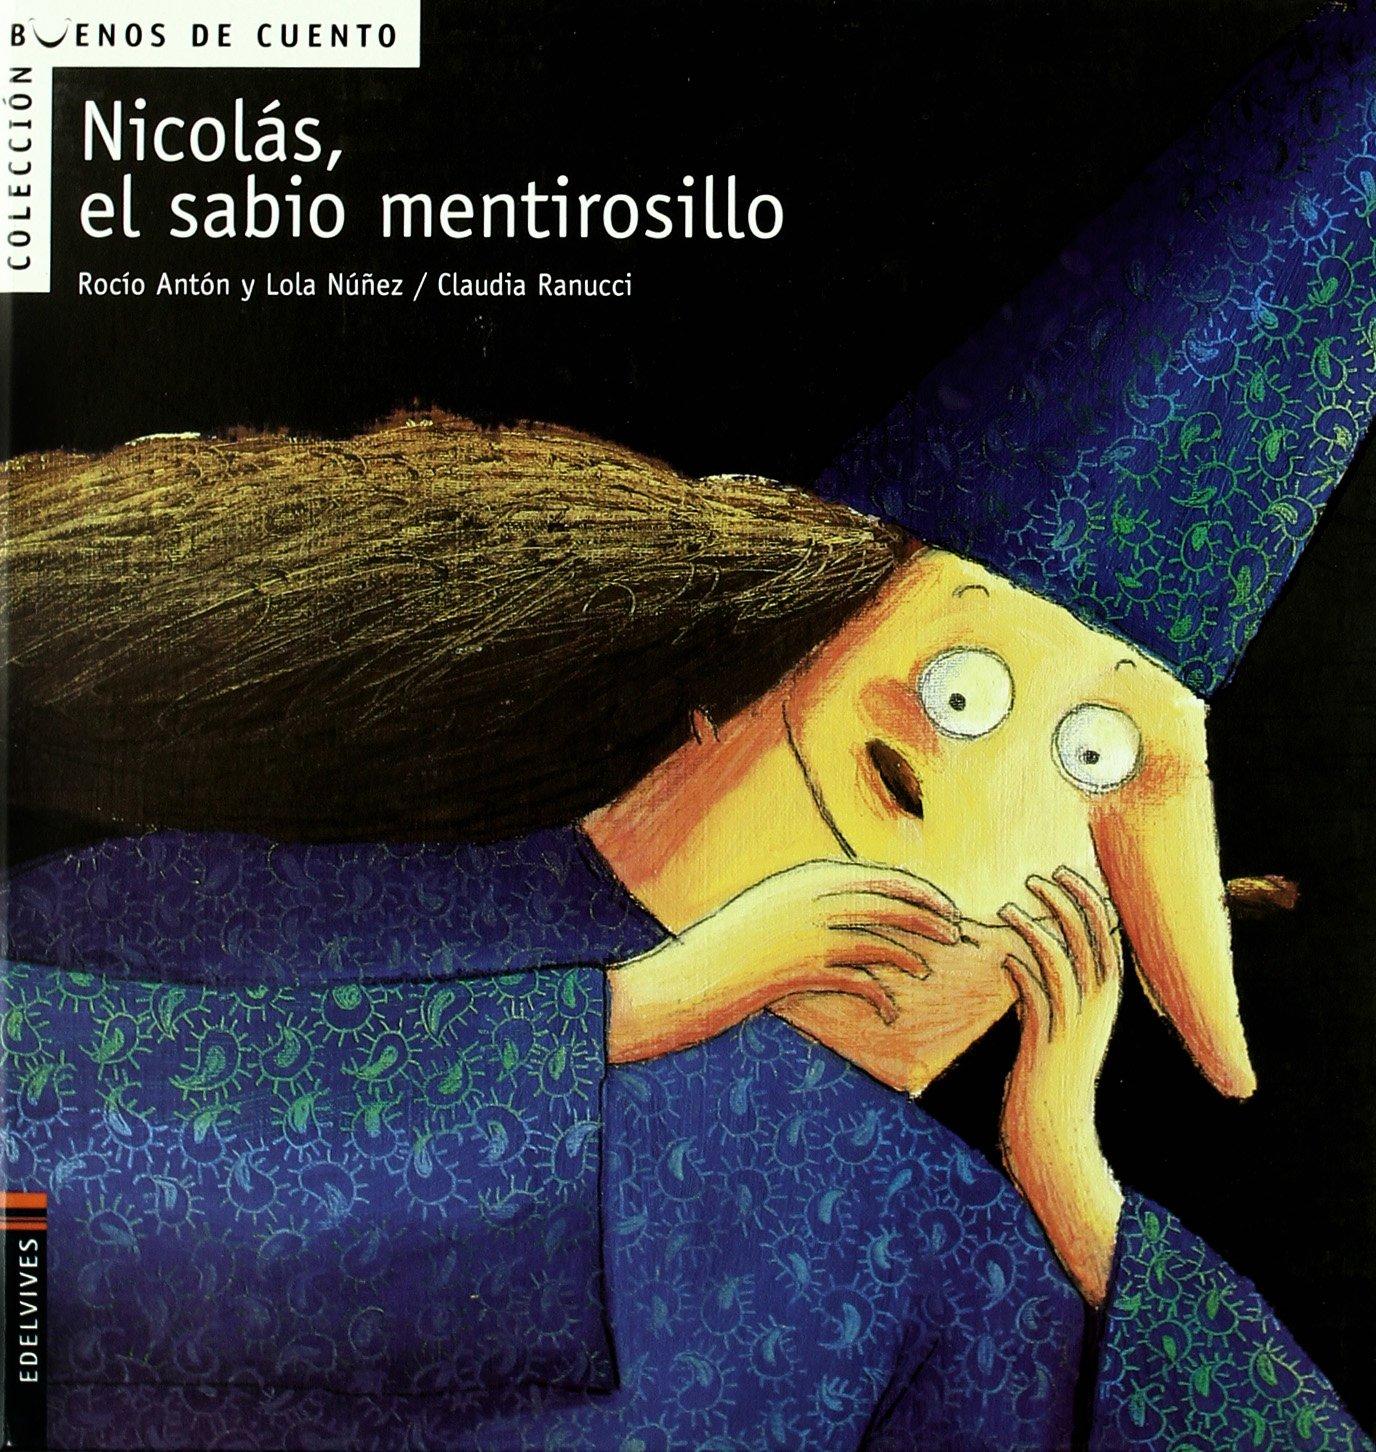 Nicolas el sabio mentirosillo (Spanish Edition): Rocio Anton ...